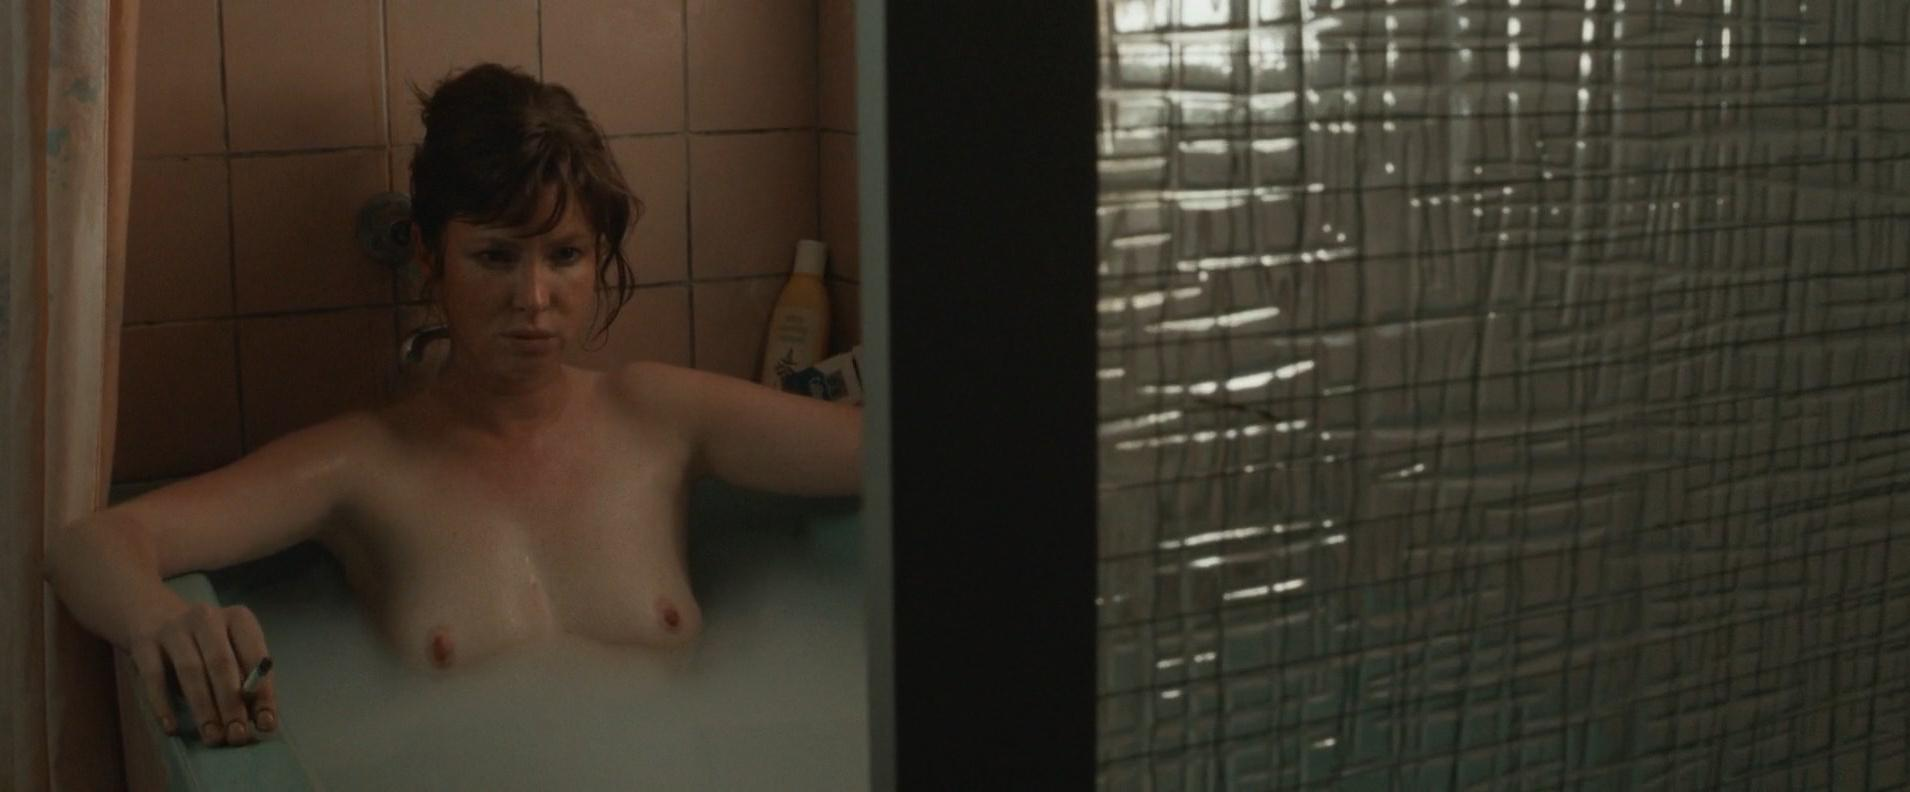 naked (77 photo), Instagram Celebrites pictures